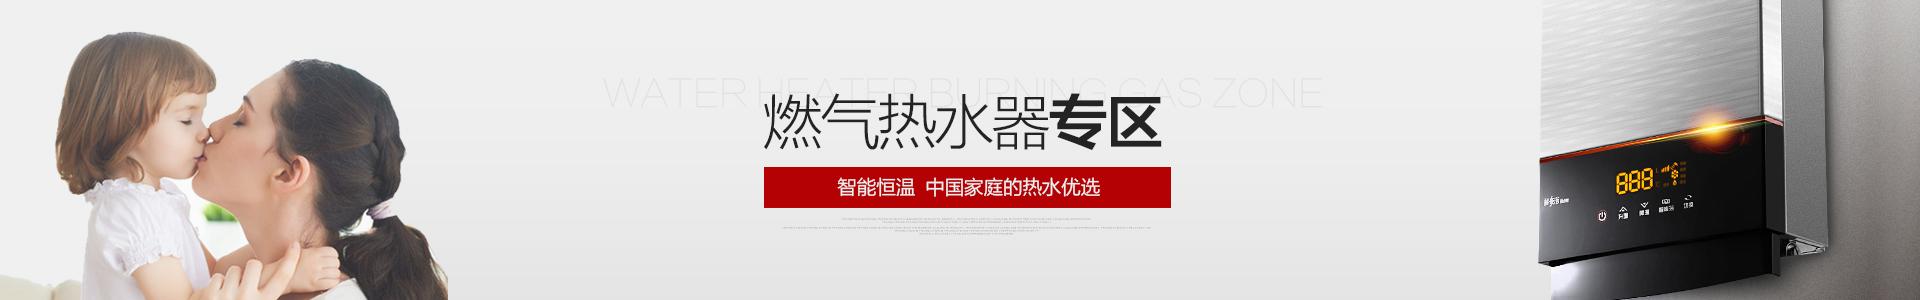 燃热banner.jpg